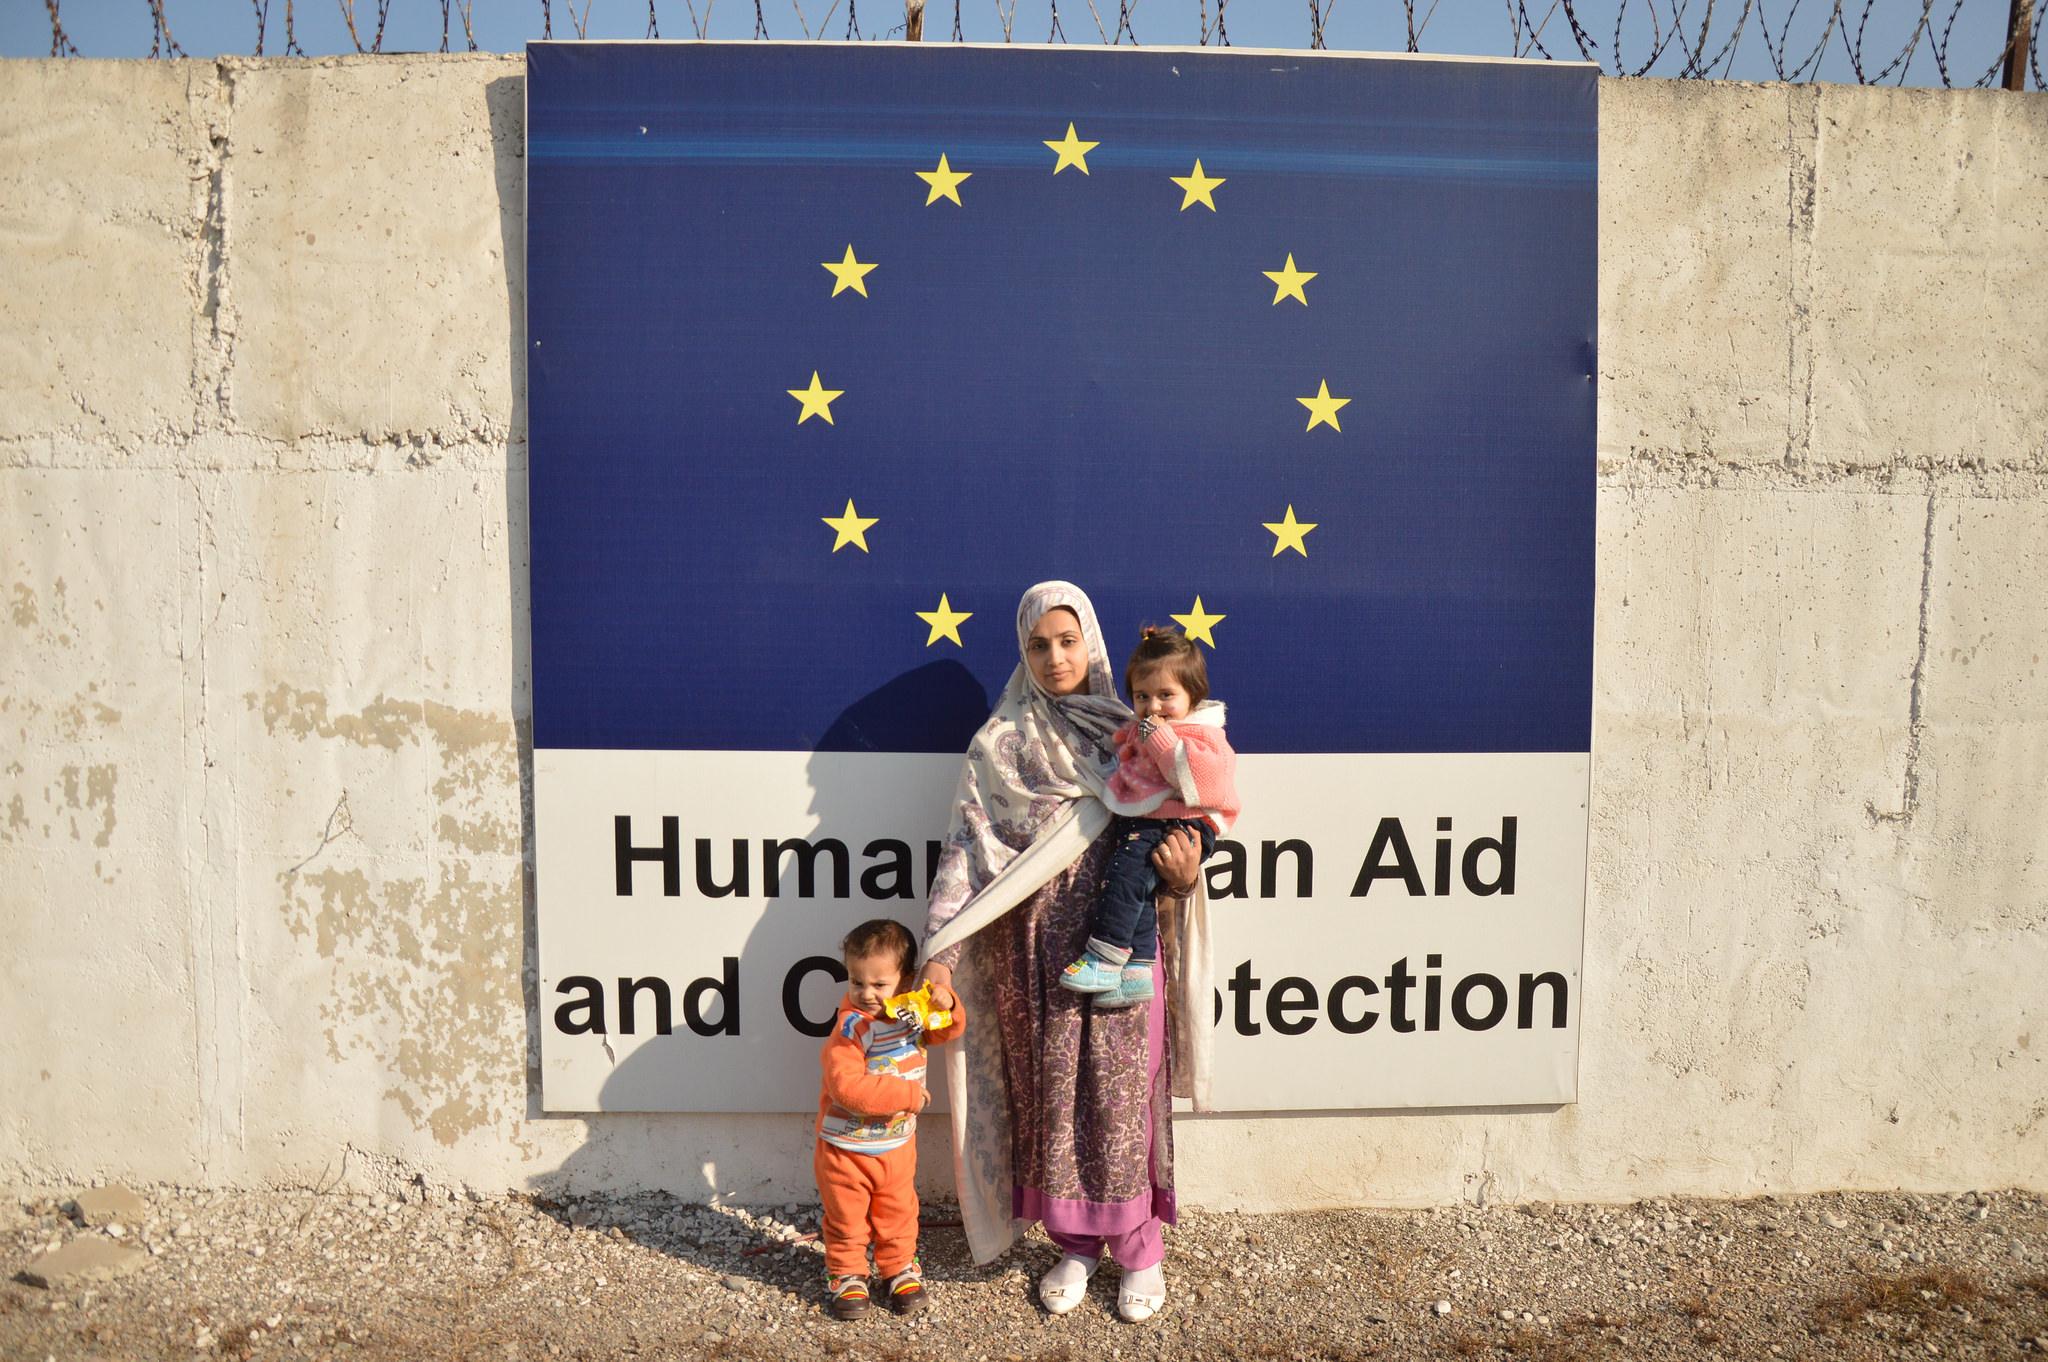 Photo: European Commission DG ECHO (CC BY-NC-ND 2.0) - https://www.flickr.com/photos/eu_echo/27504828341/in/photolist-HUvrdi-uGfTBL-uYmQVY-VSG26t-UAcJbf-VPcQFL-zJm964-DcgL9b-DcgdXU-DcfAFA-VPcVGC-VBZy6s-uA8nMU-xWbFUN-Dey7nx-UD7N1F-UD7U42-QvXDcm-VPd3e5-ks8kEV-pQGKjn-jmPfi7-a3BRvB-9oYnFC-9wsGJJ-a4MdEU-h7u2oC-pbokzX-jmLUZE-a3Twhh-aZNHGT-mXrJ4n-a4aS59-a47Ysi-a47Ze2-a4aT1U-eYz8CR-dzyGrp-jmJTqT-a482Jn-a4aStY-a4aJH7-a4aNs3-a47ZPR-a47XaT-a4aKu1-pdTC6R-a47V6F-ekyobL-eYLvZq